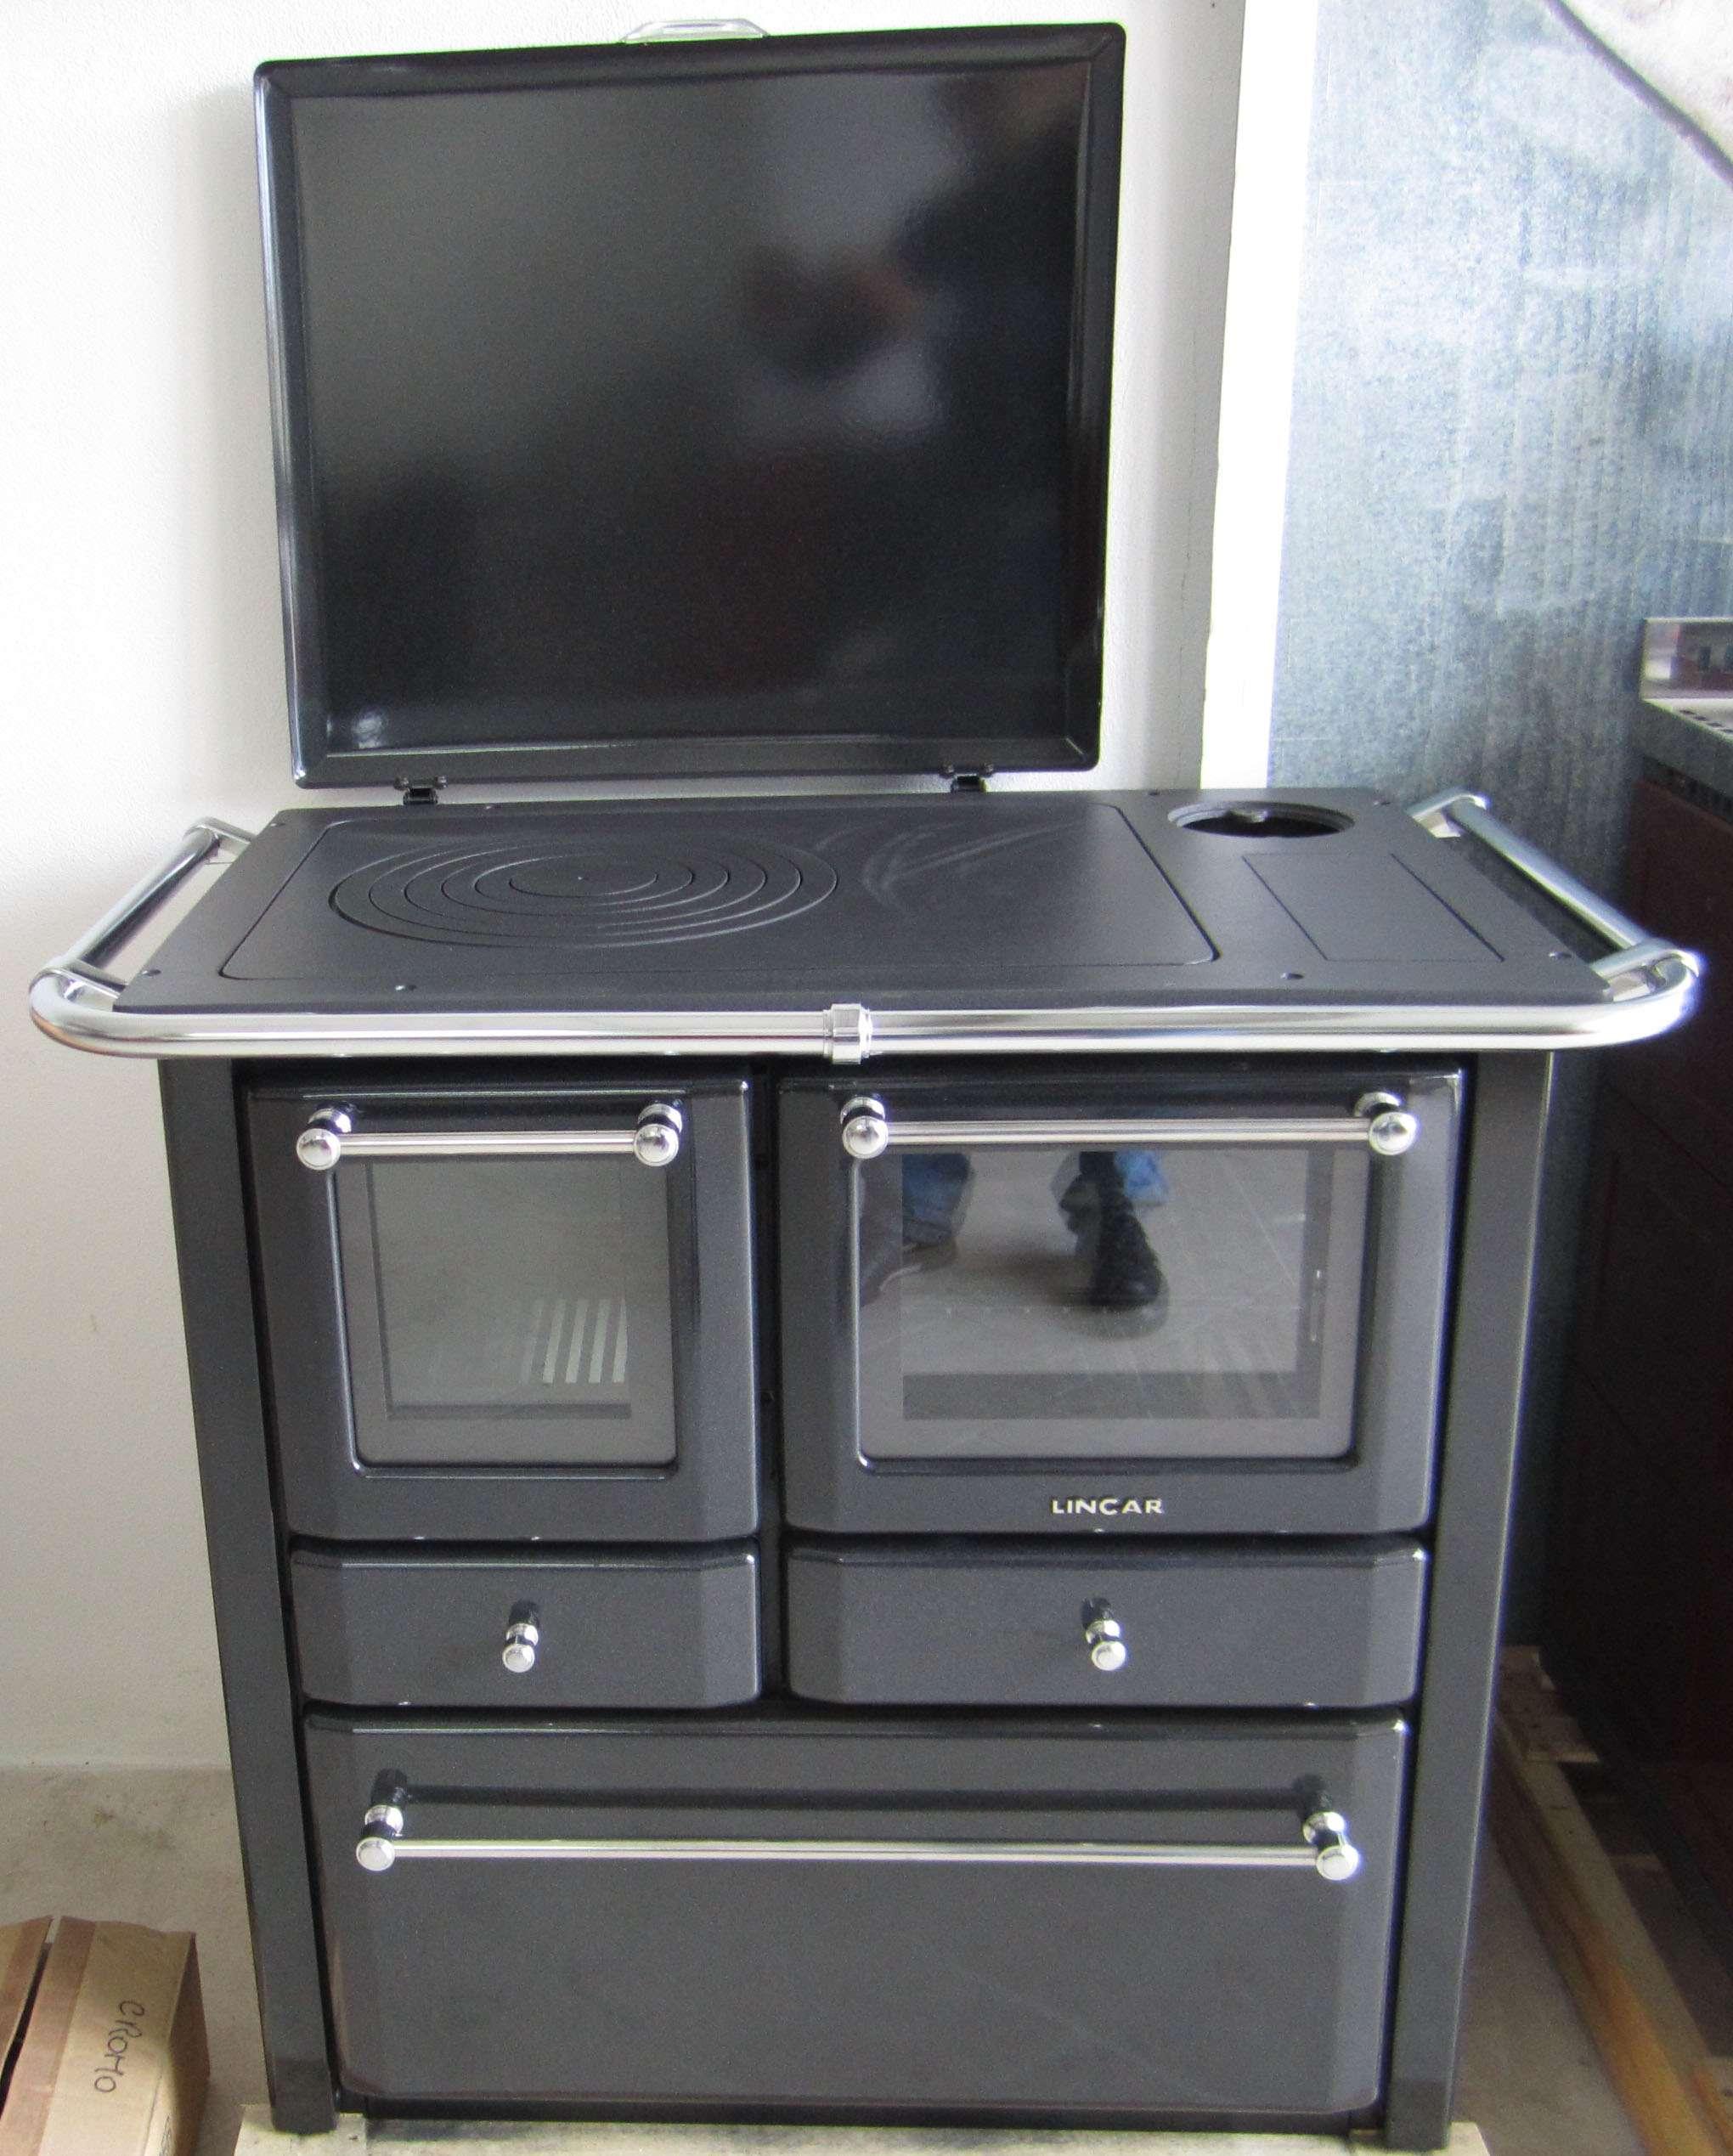 Cucina A Legna Lincar.Cucina A Legna Lincar Modello Gaia 148 V Kw 8 Imar